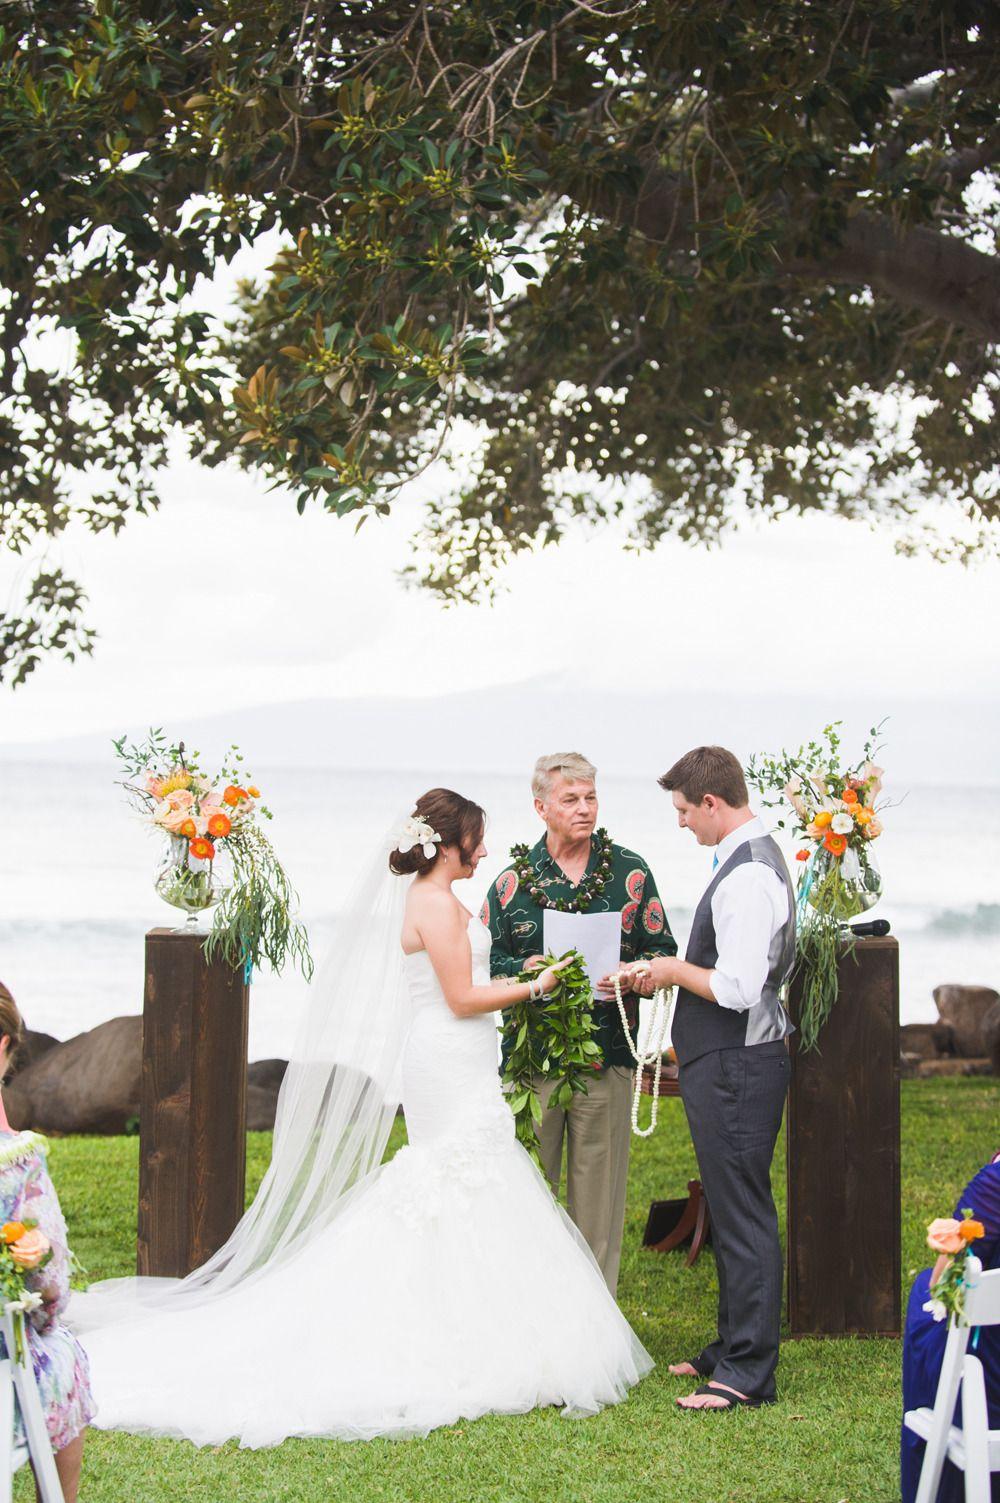 Photography: Candice Benjamin Photography - candicebenjamin.com  Read More: http://www.stylemepretty.com/little-black-book-blog/2015/01/28/colorful-spring-maui-wedding/